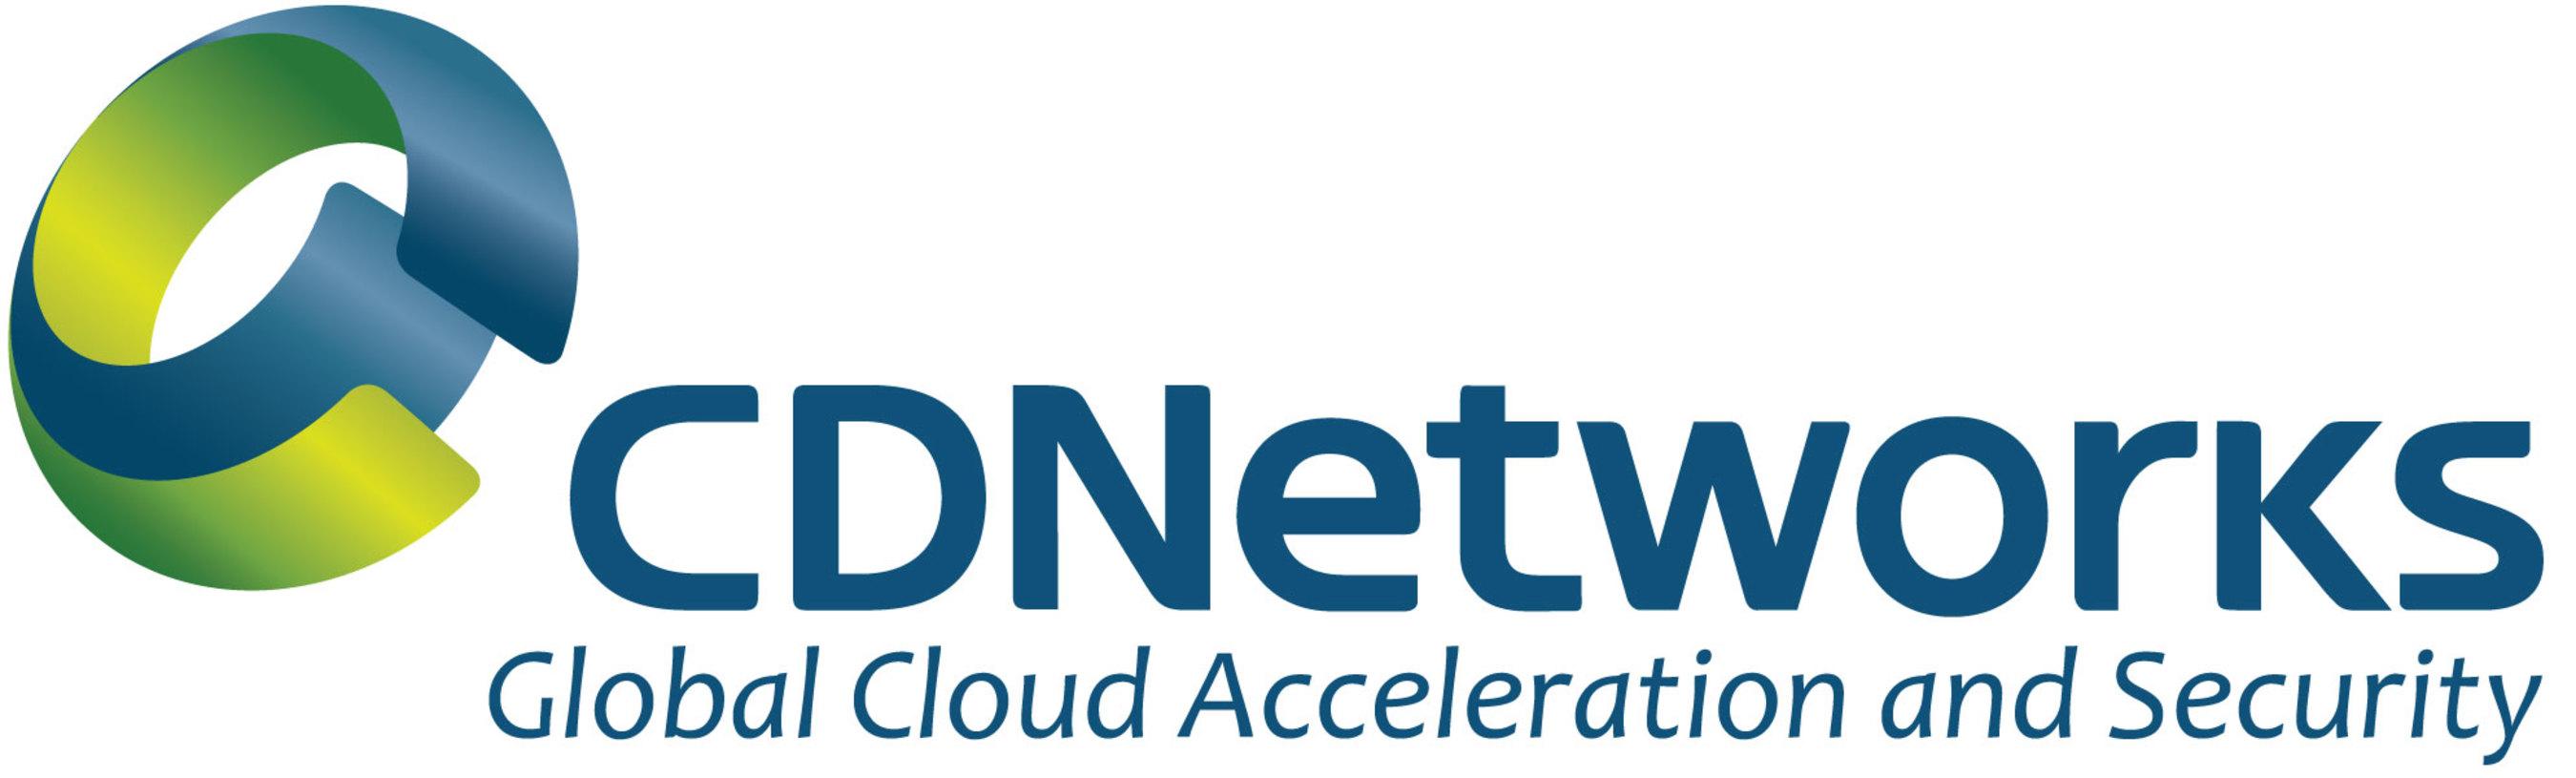 CDNetworks annuncia Enterprise Application Security (EAS)